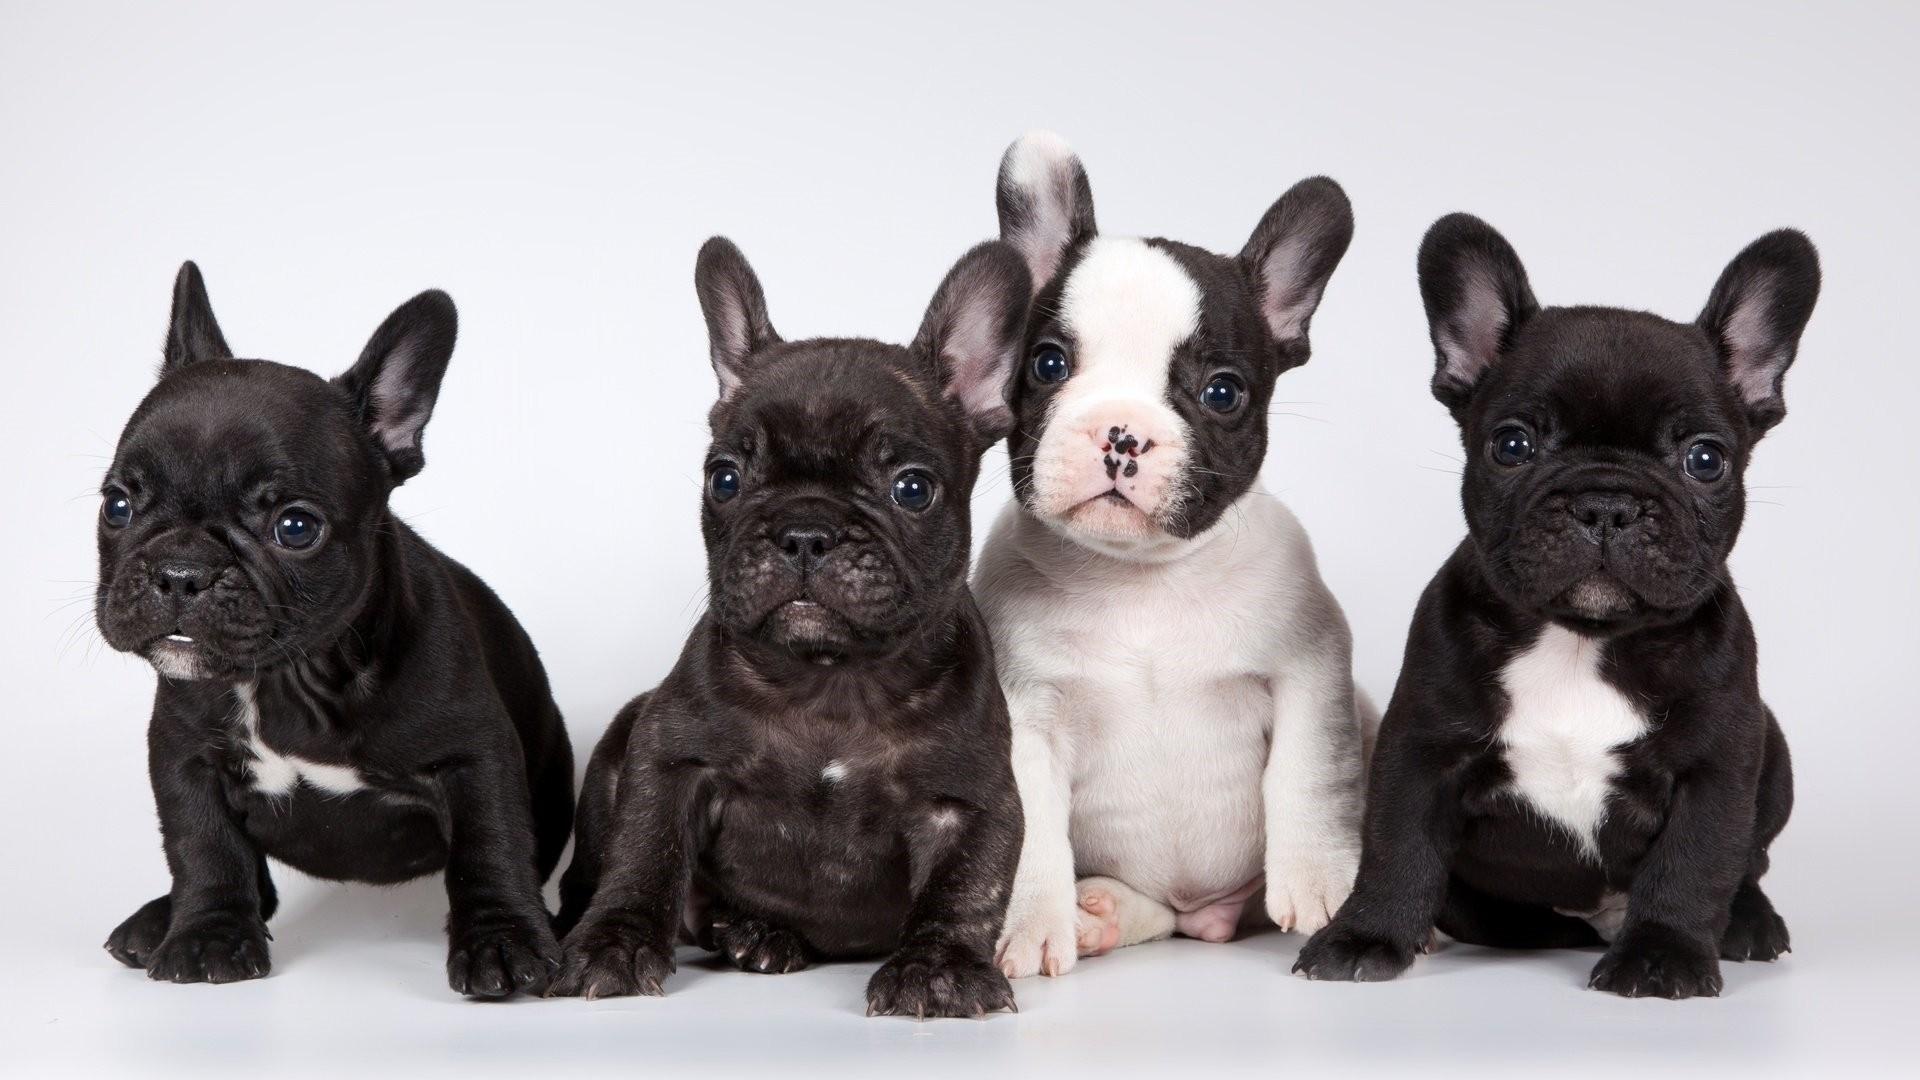 French Bulldog Image